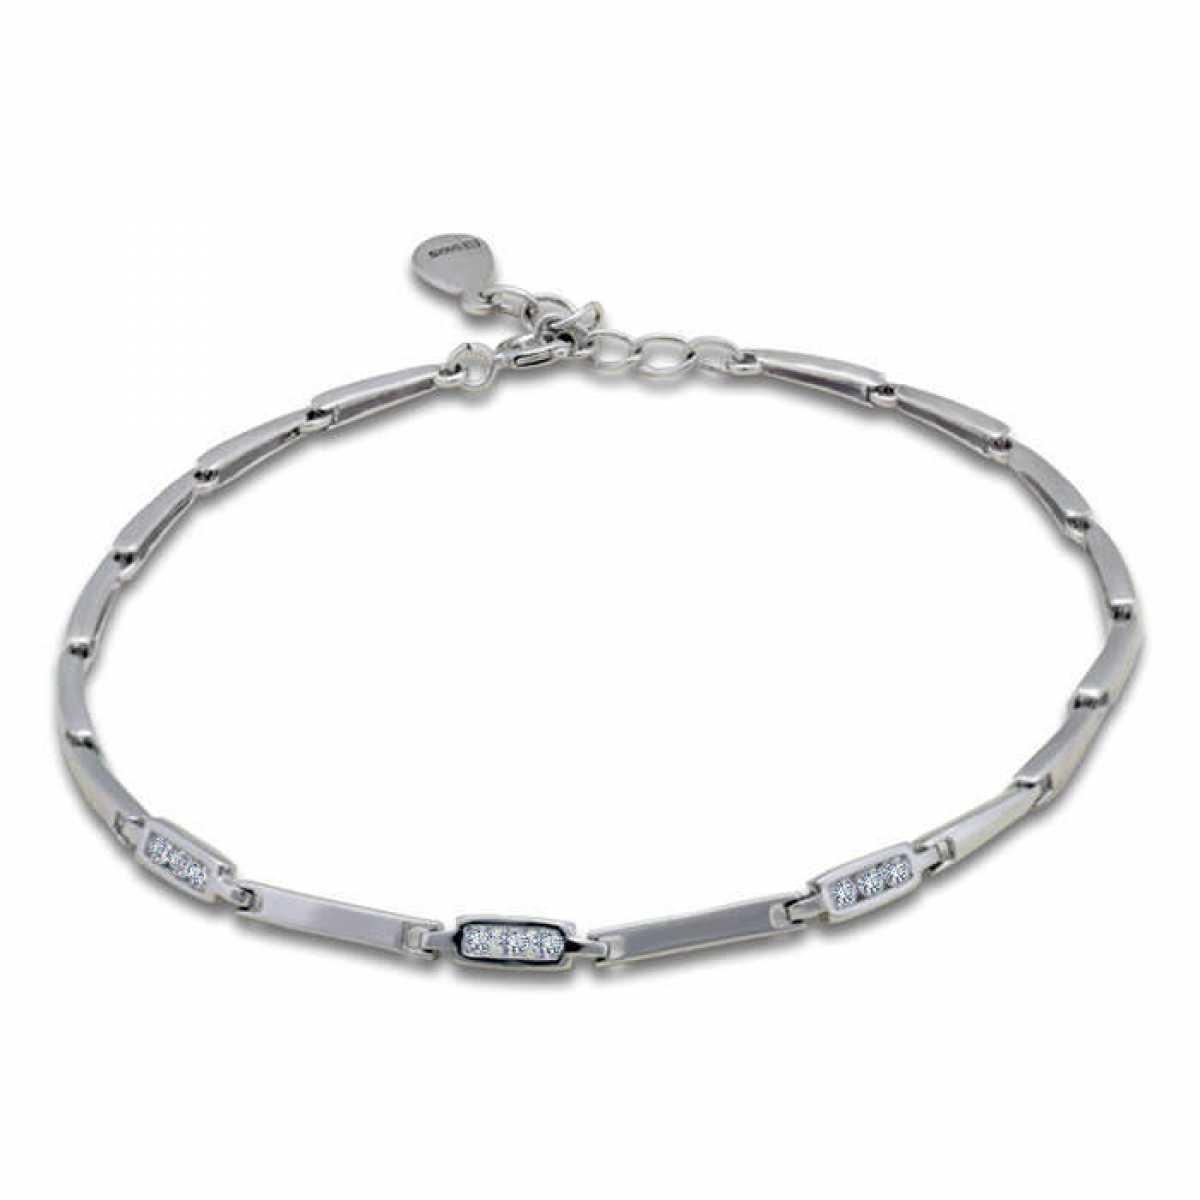 Elegant And Delicate Silver Bracelet